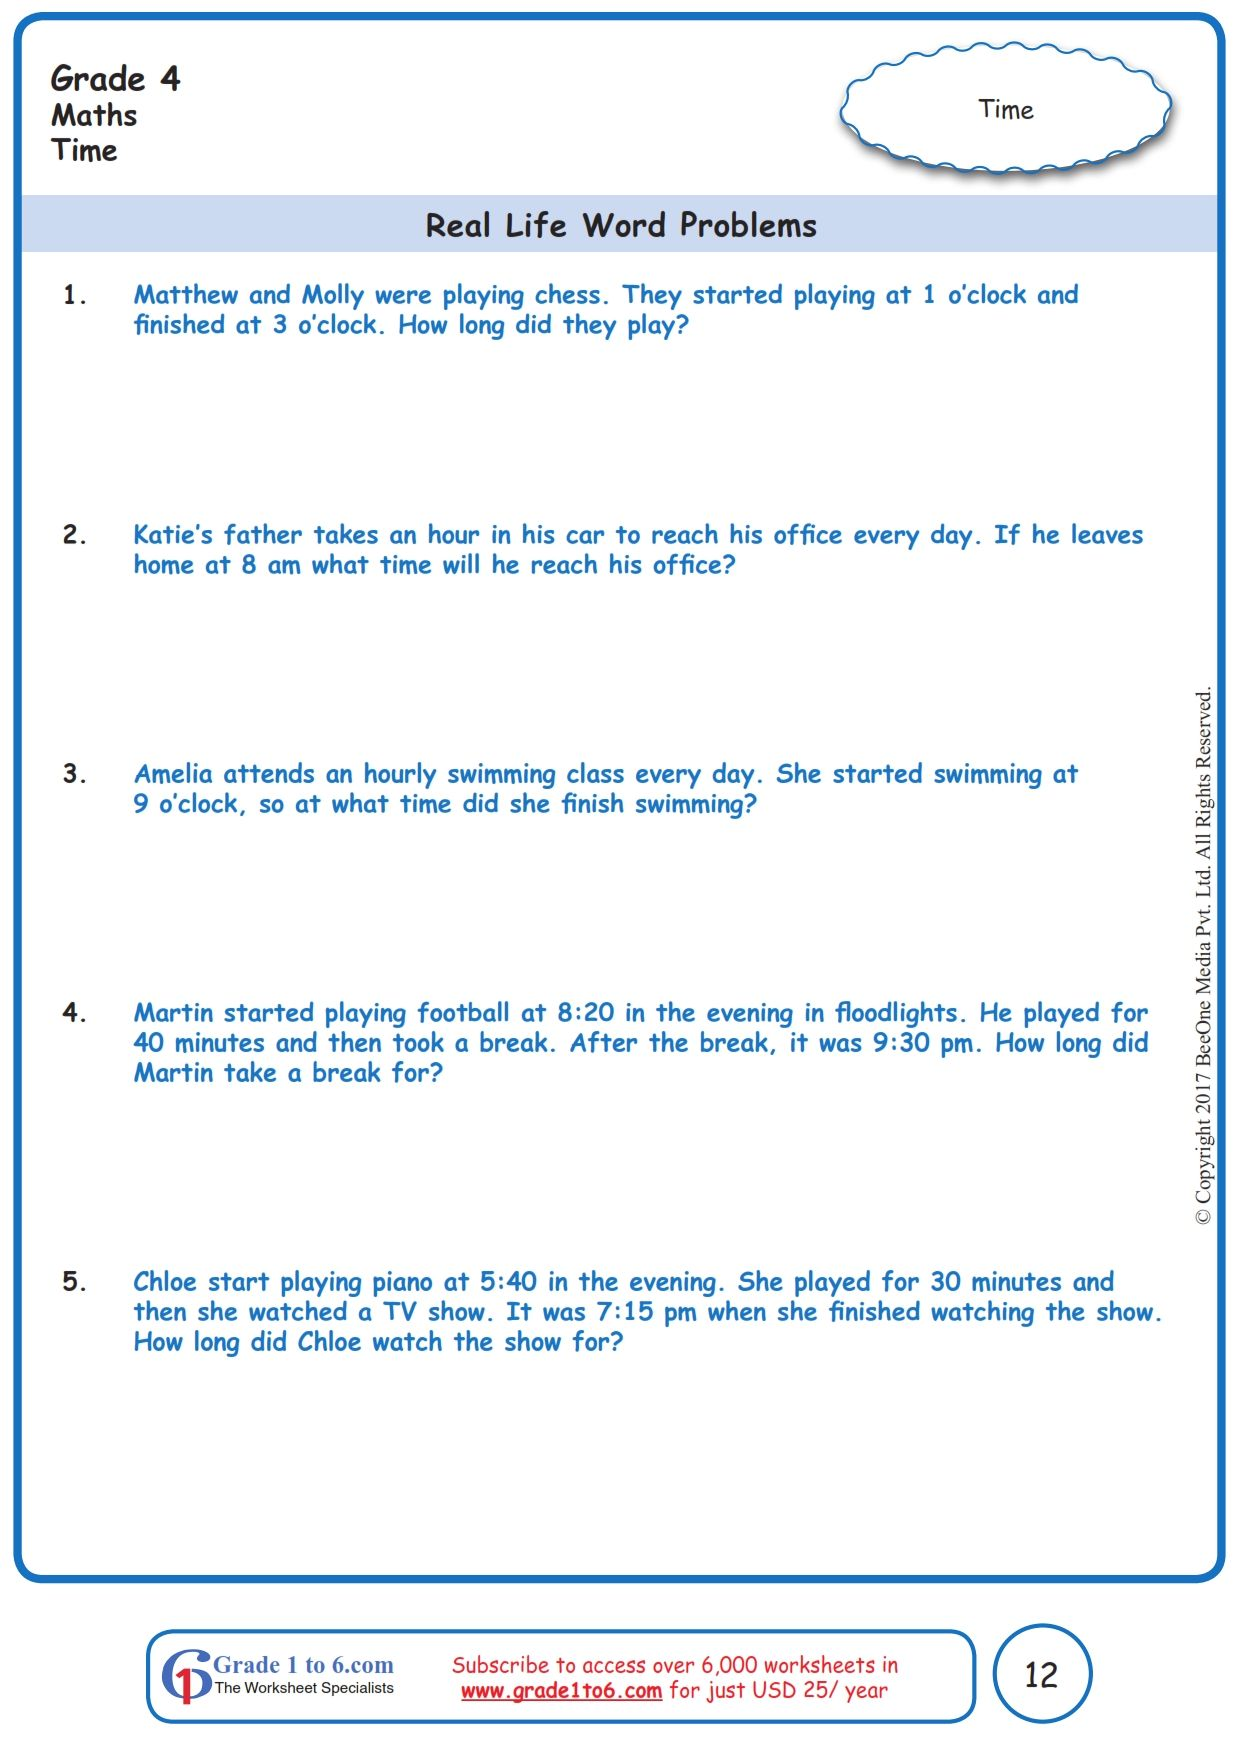 Pin By Ade1to6 Free Math En On Grade 4 Math